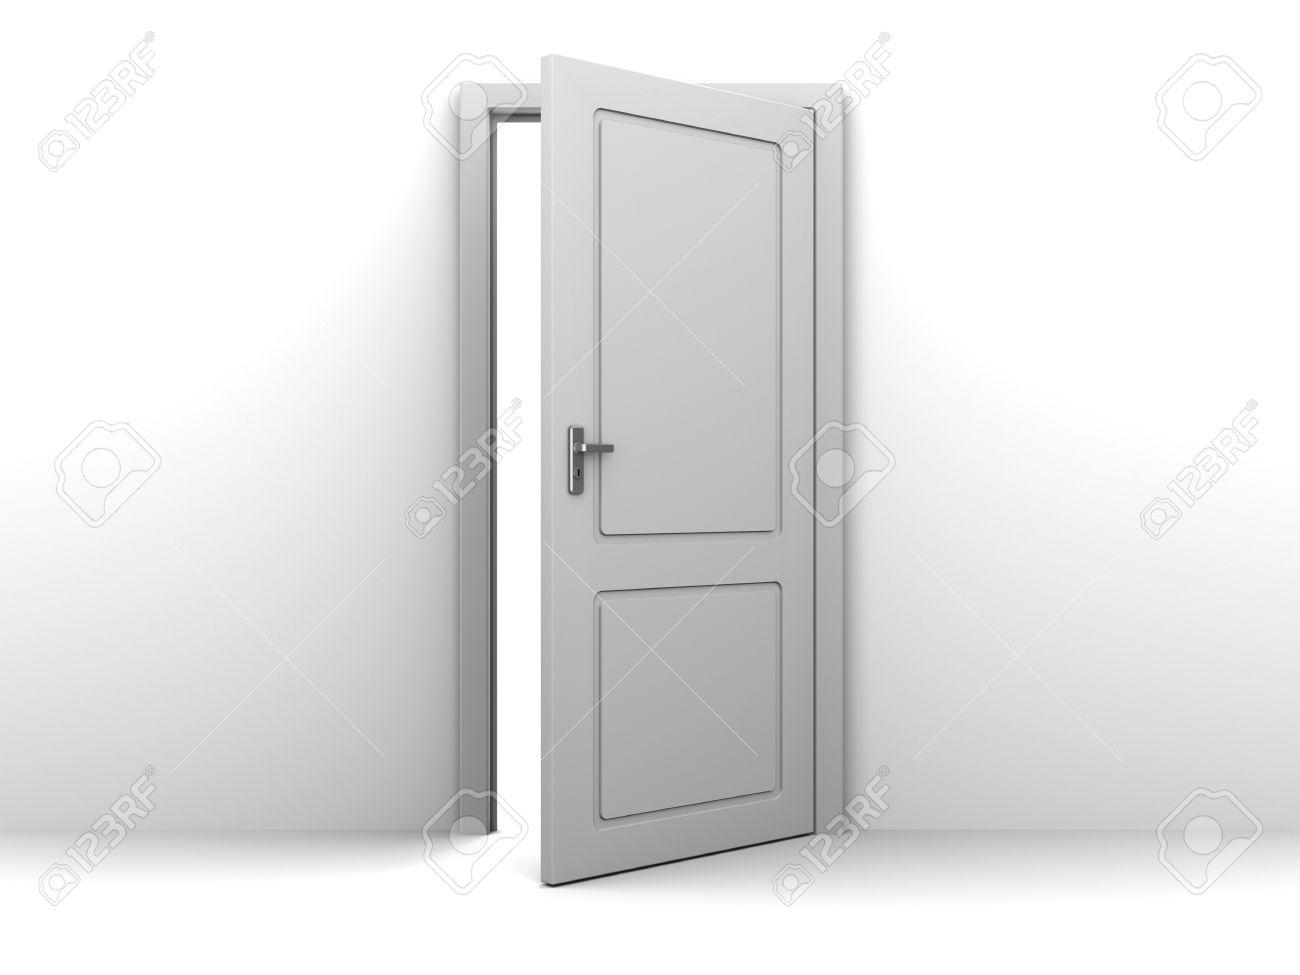 Delicieux 3d Illustration Of Half Open Door Stock Illustration   59199277